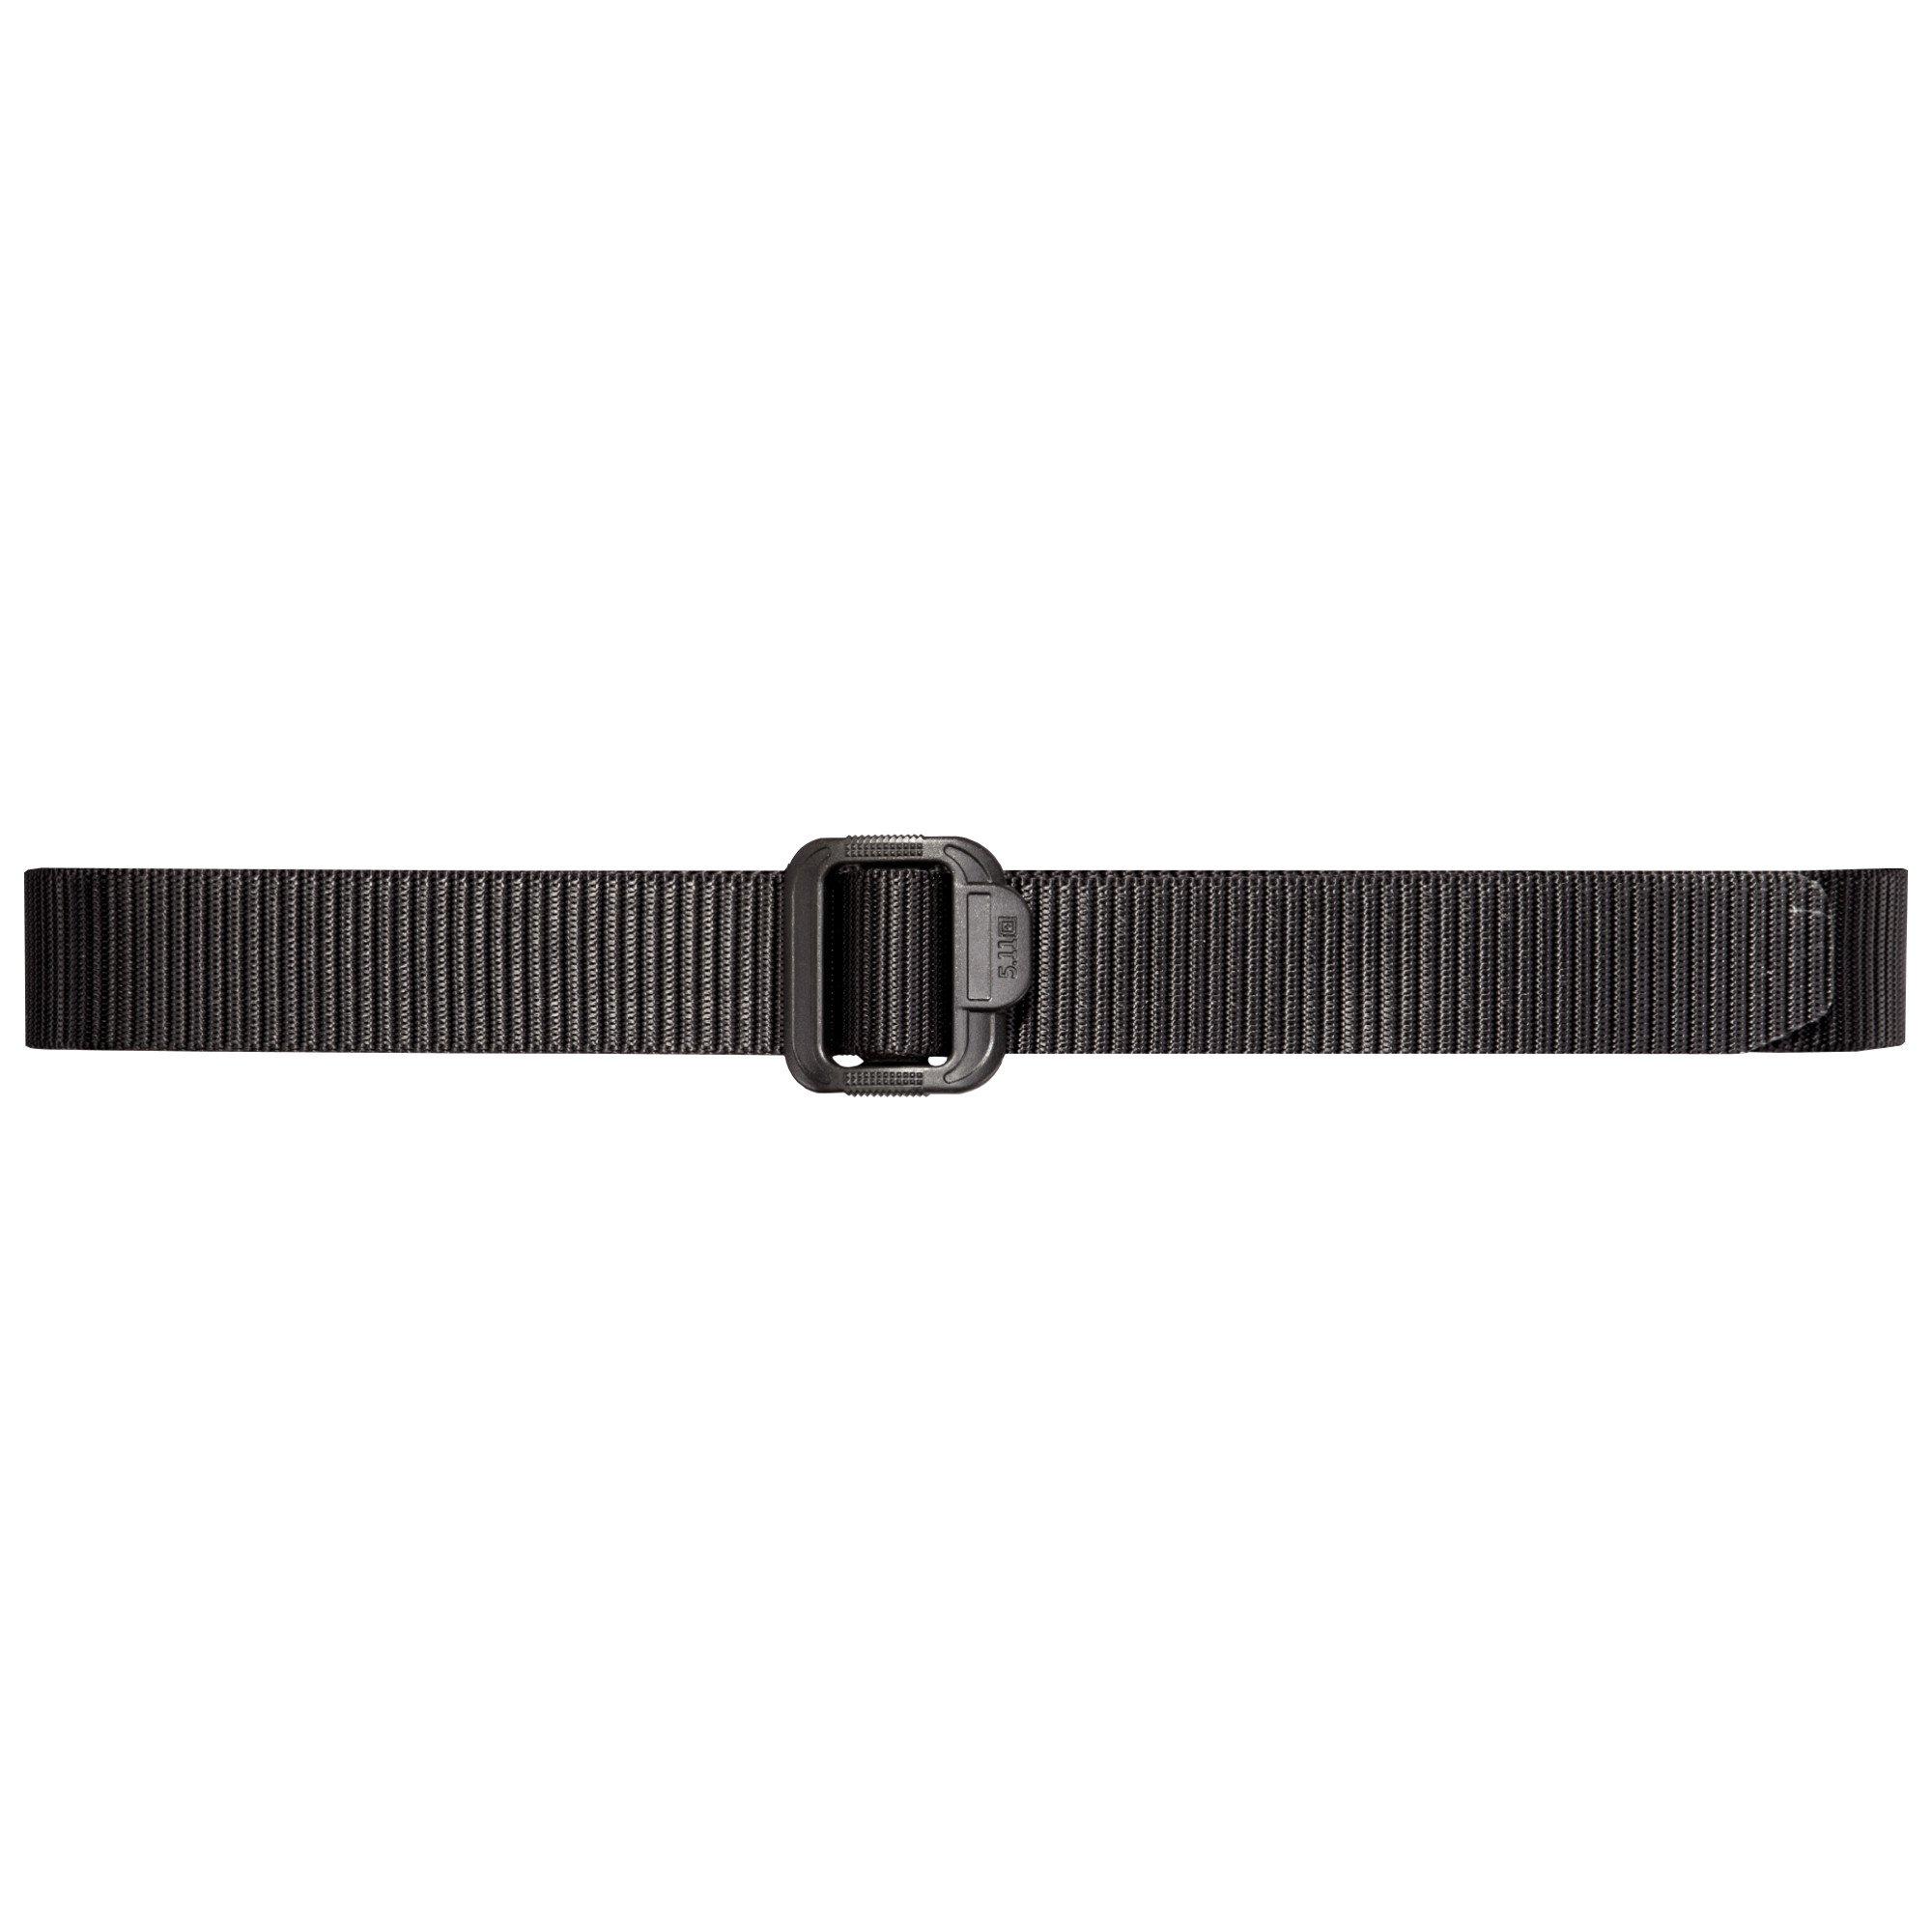 1.5″ TDU BELT – Black